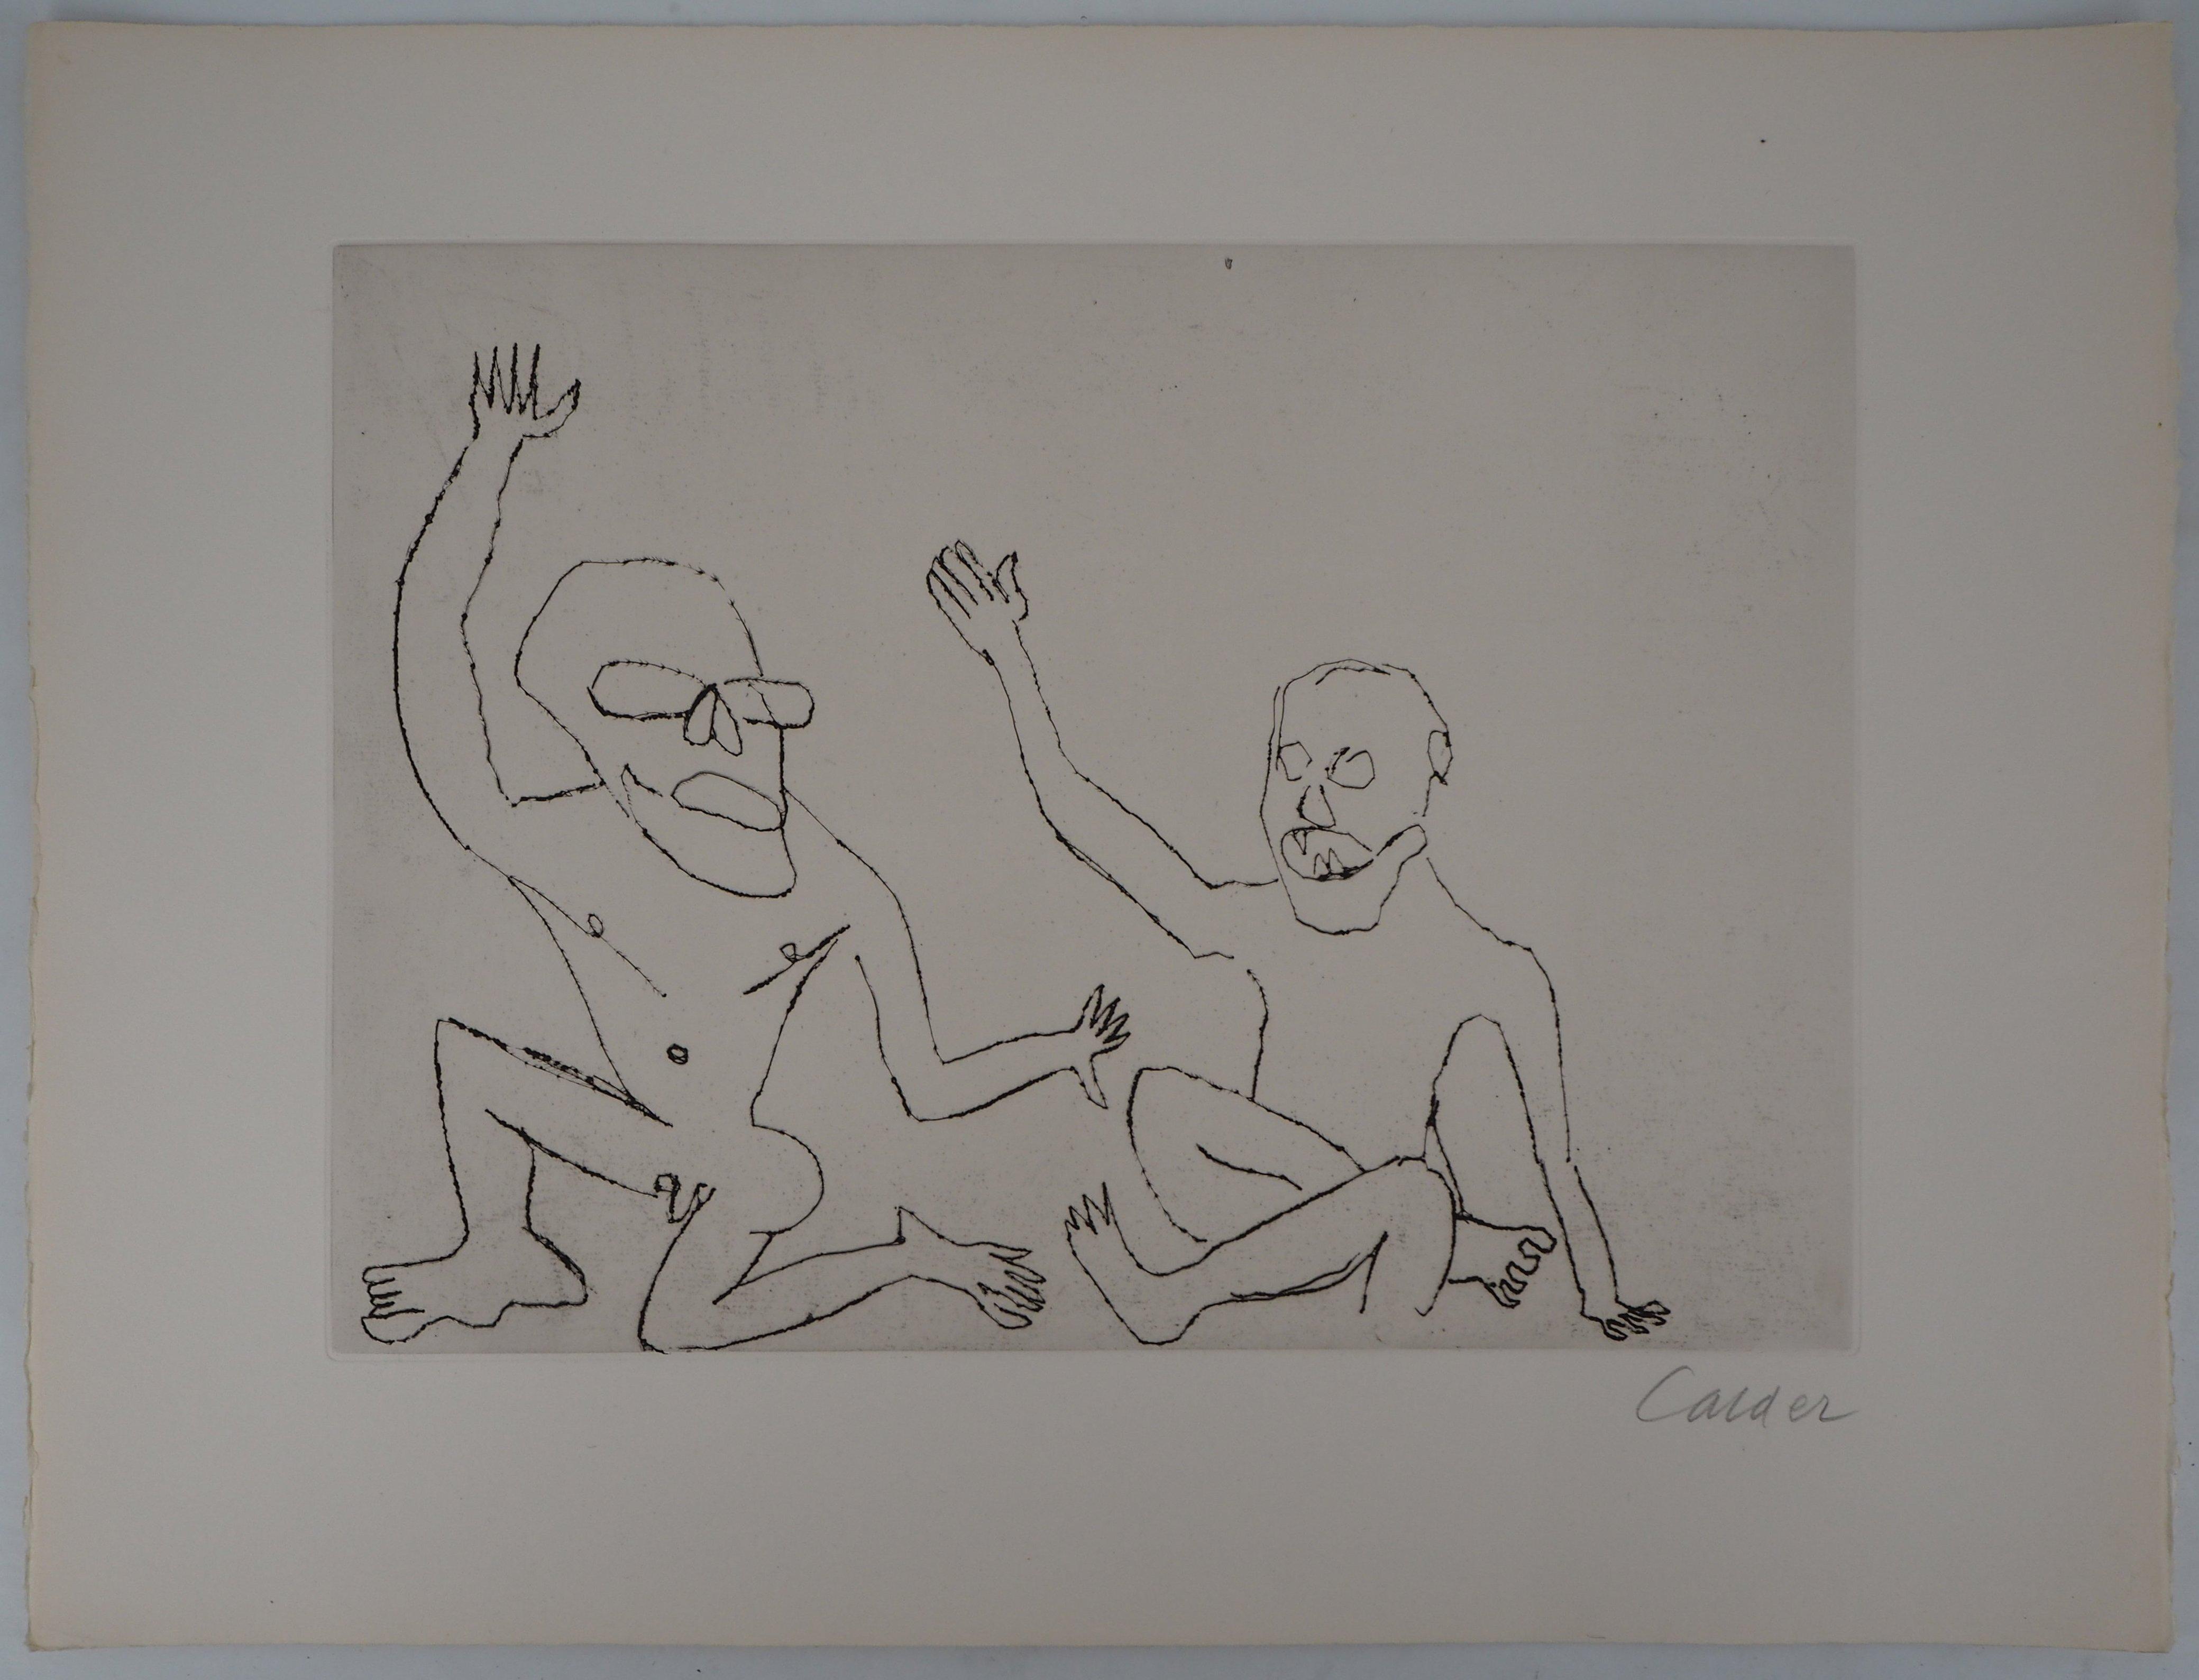 Santa Claus : Two Men - Original Handsigned Etching